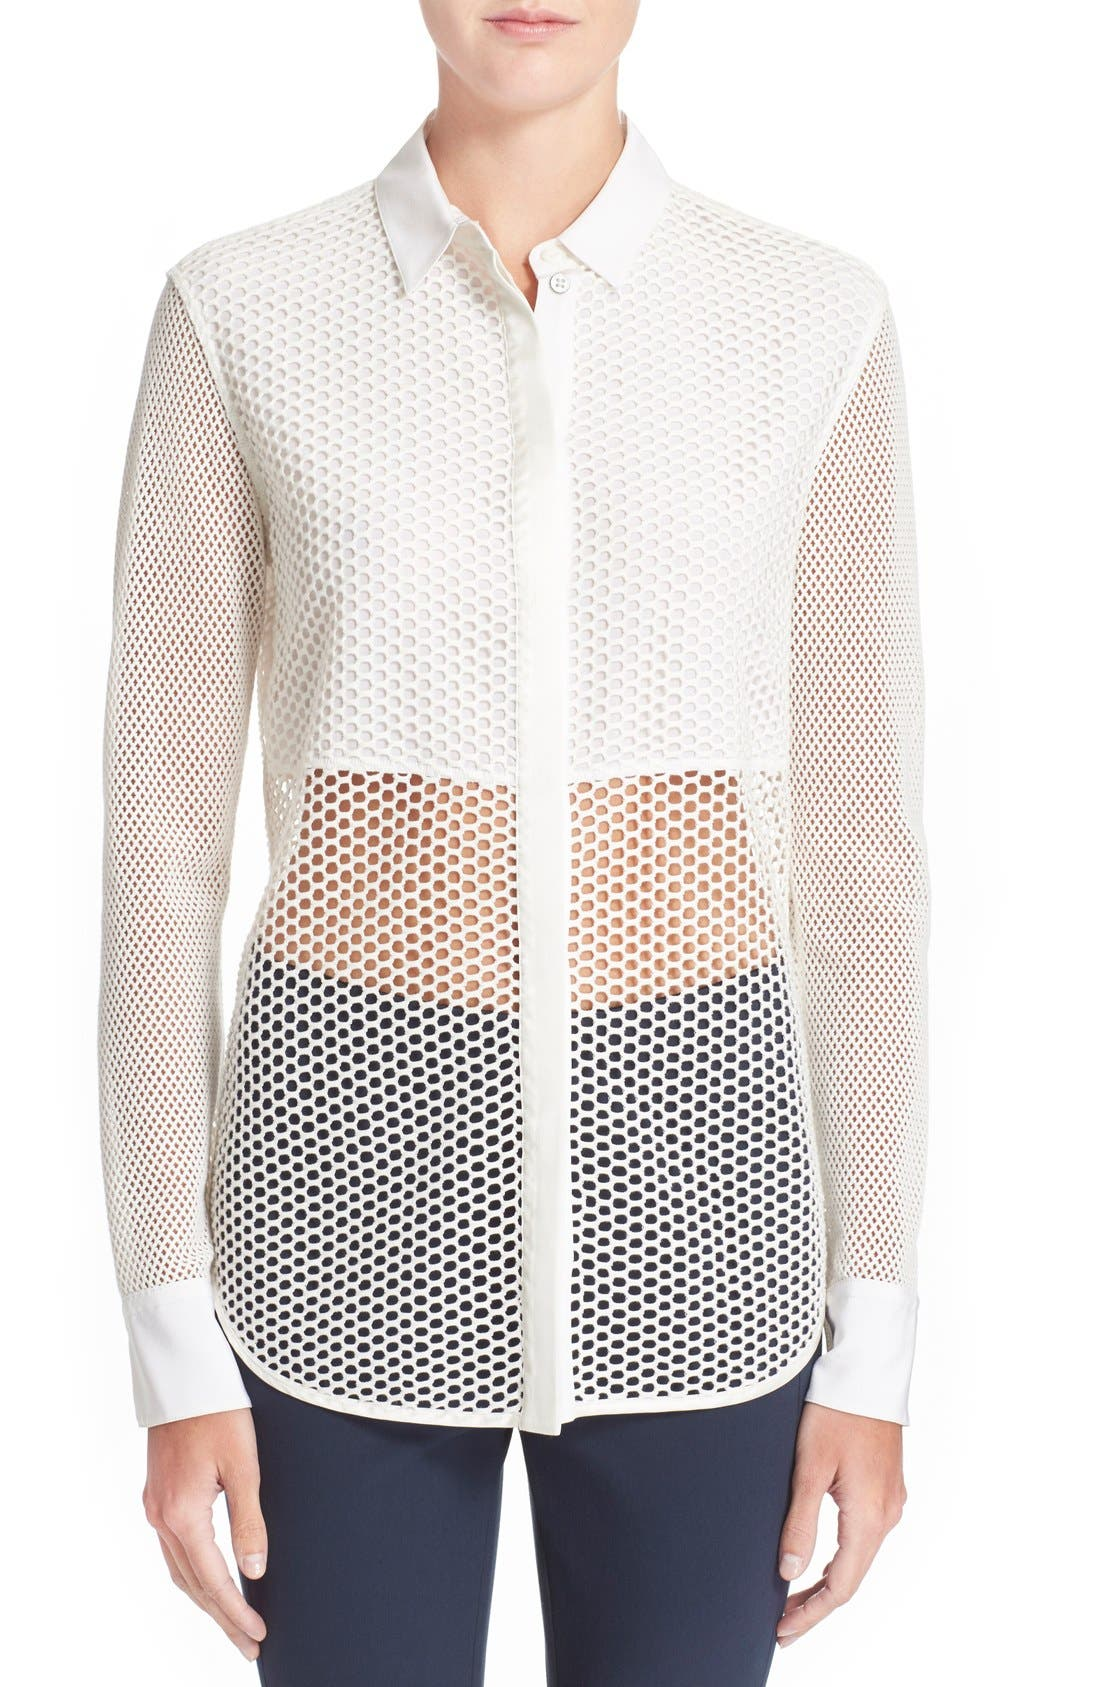 Alternate Image 1 Selected - rag & bone 'Luna' Stretch Cotton Mesh Shirt